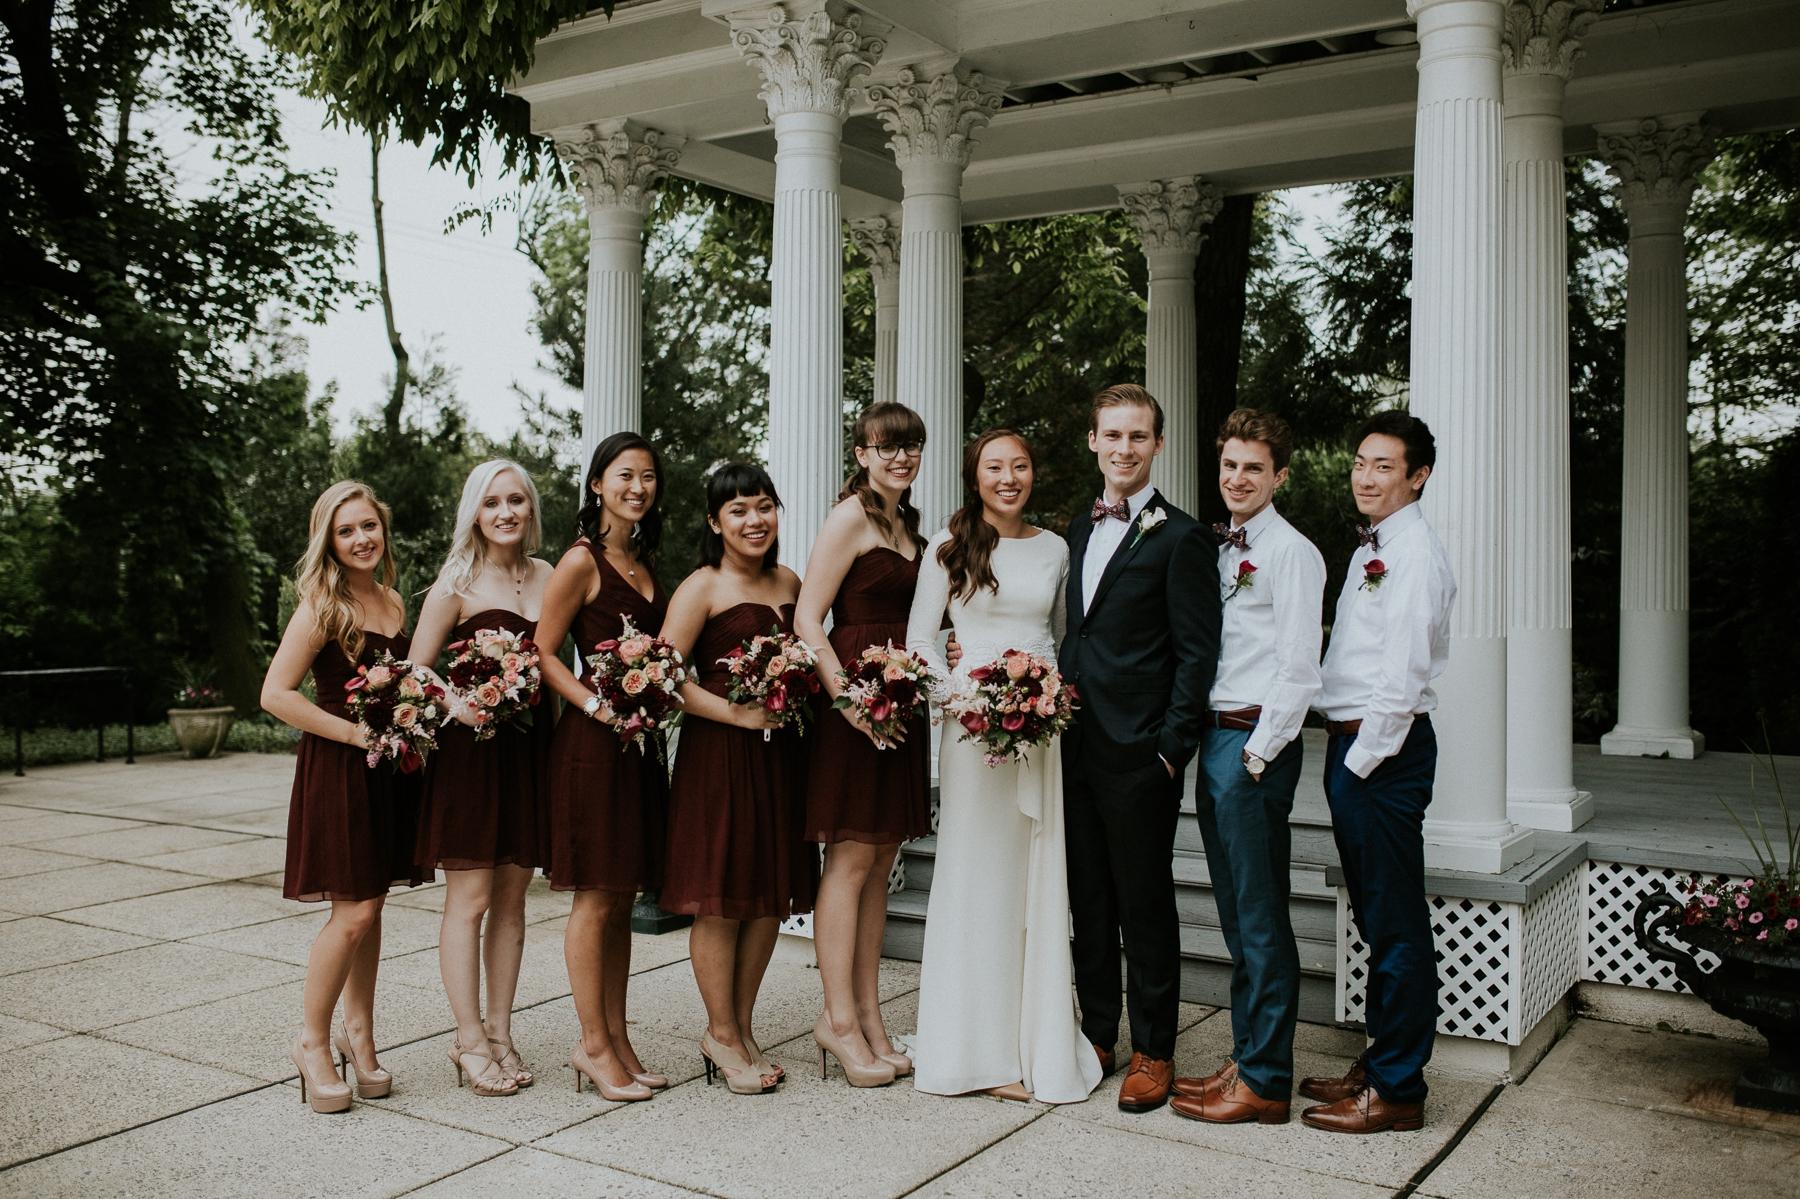 washington_dc_ceresville_mansion_wedding_photography 40.jpg